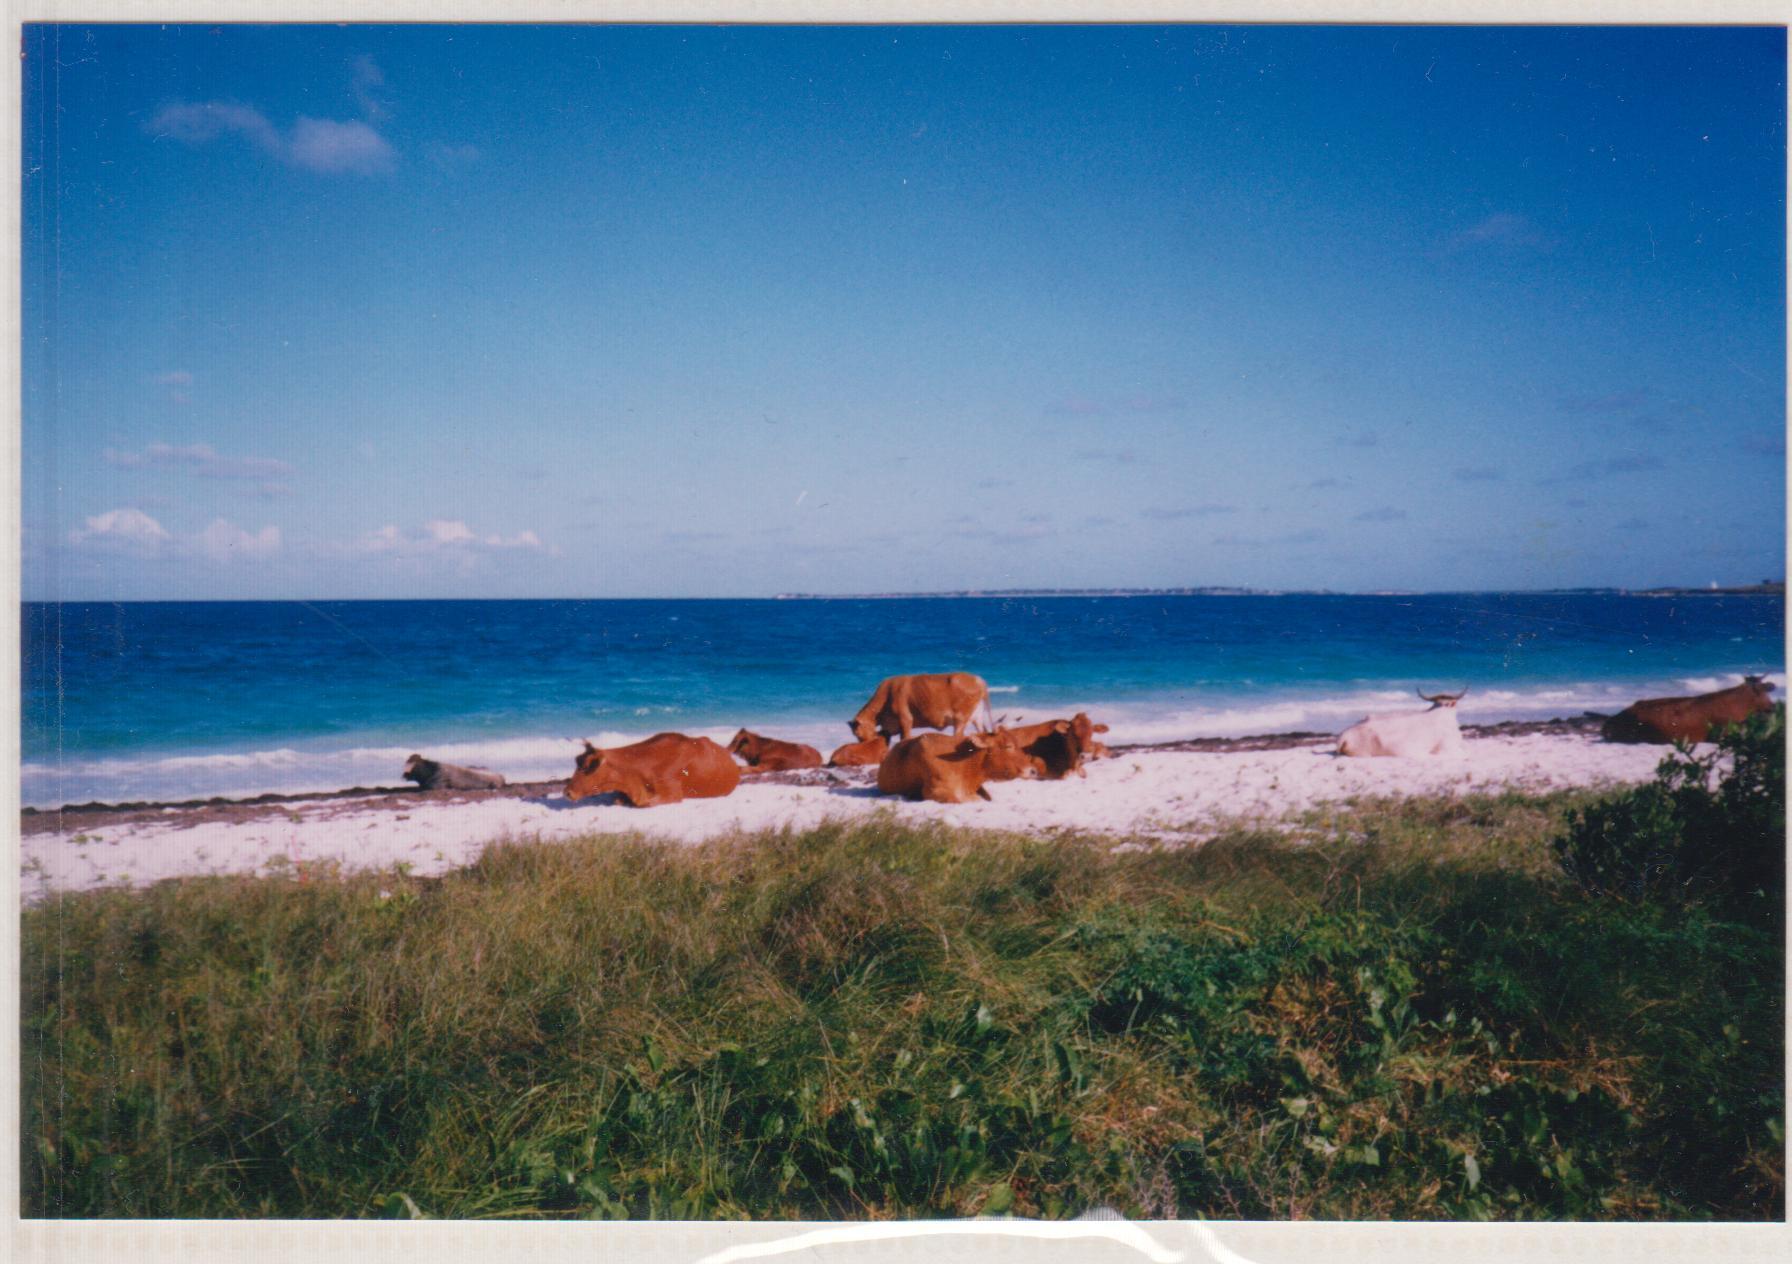 Cows on a beach in Antigua, Nicholson Yacht Charters, Caribbean weather